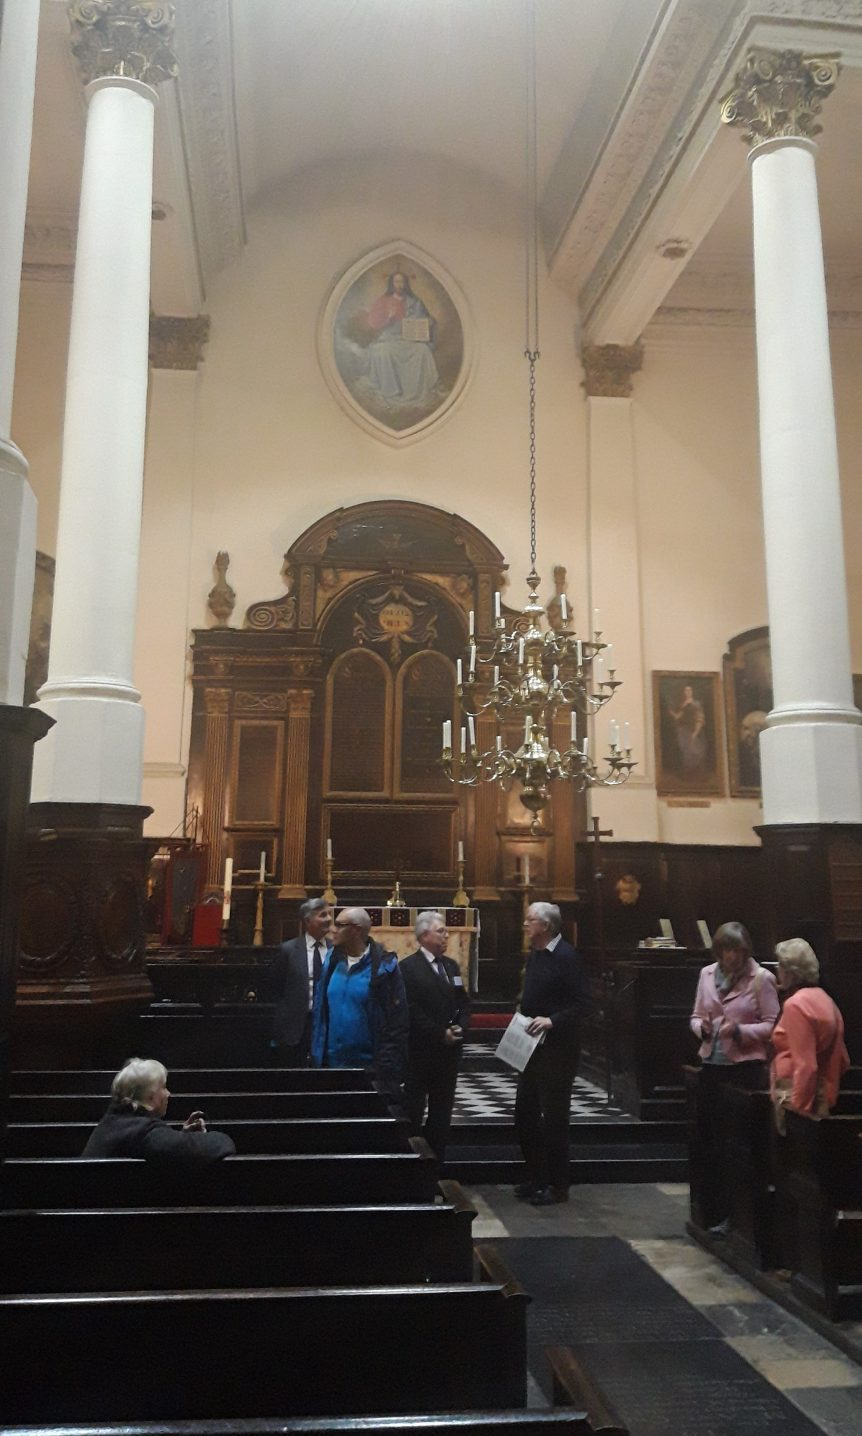 Stationers' Hall visit 4 June 2019